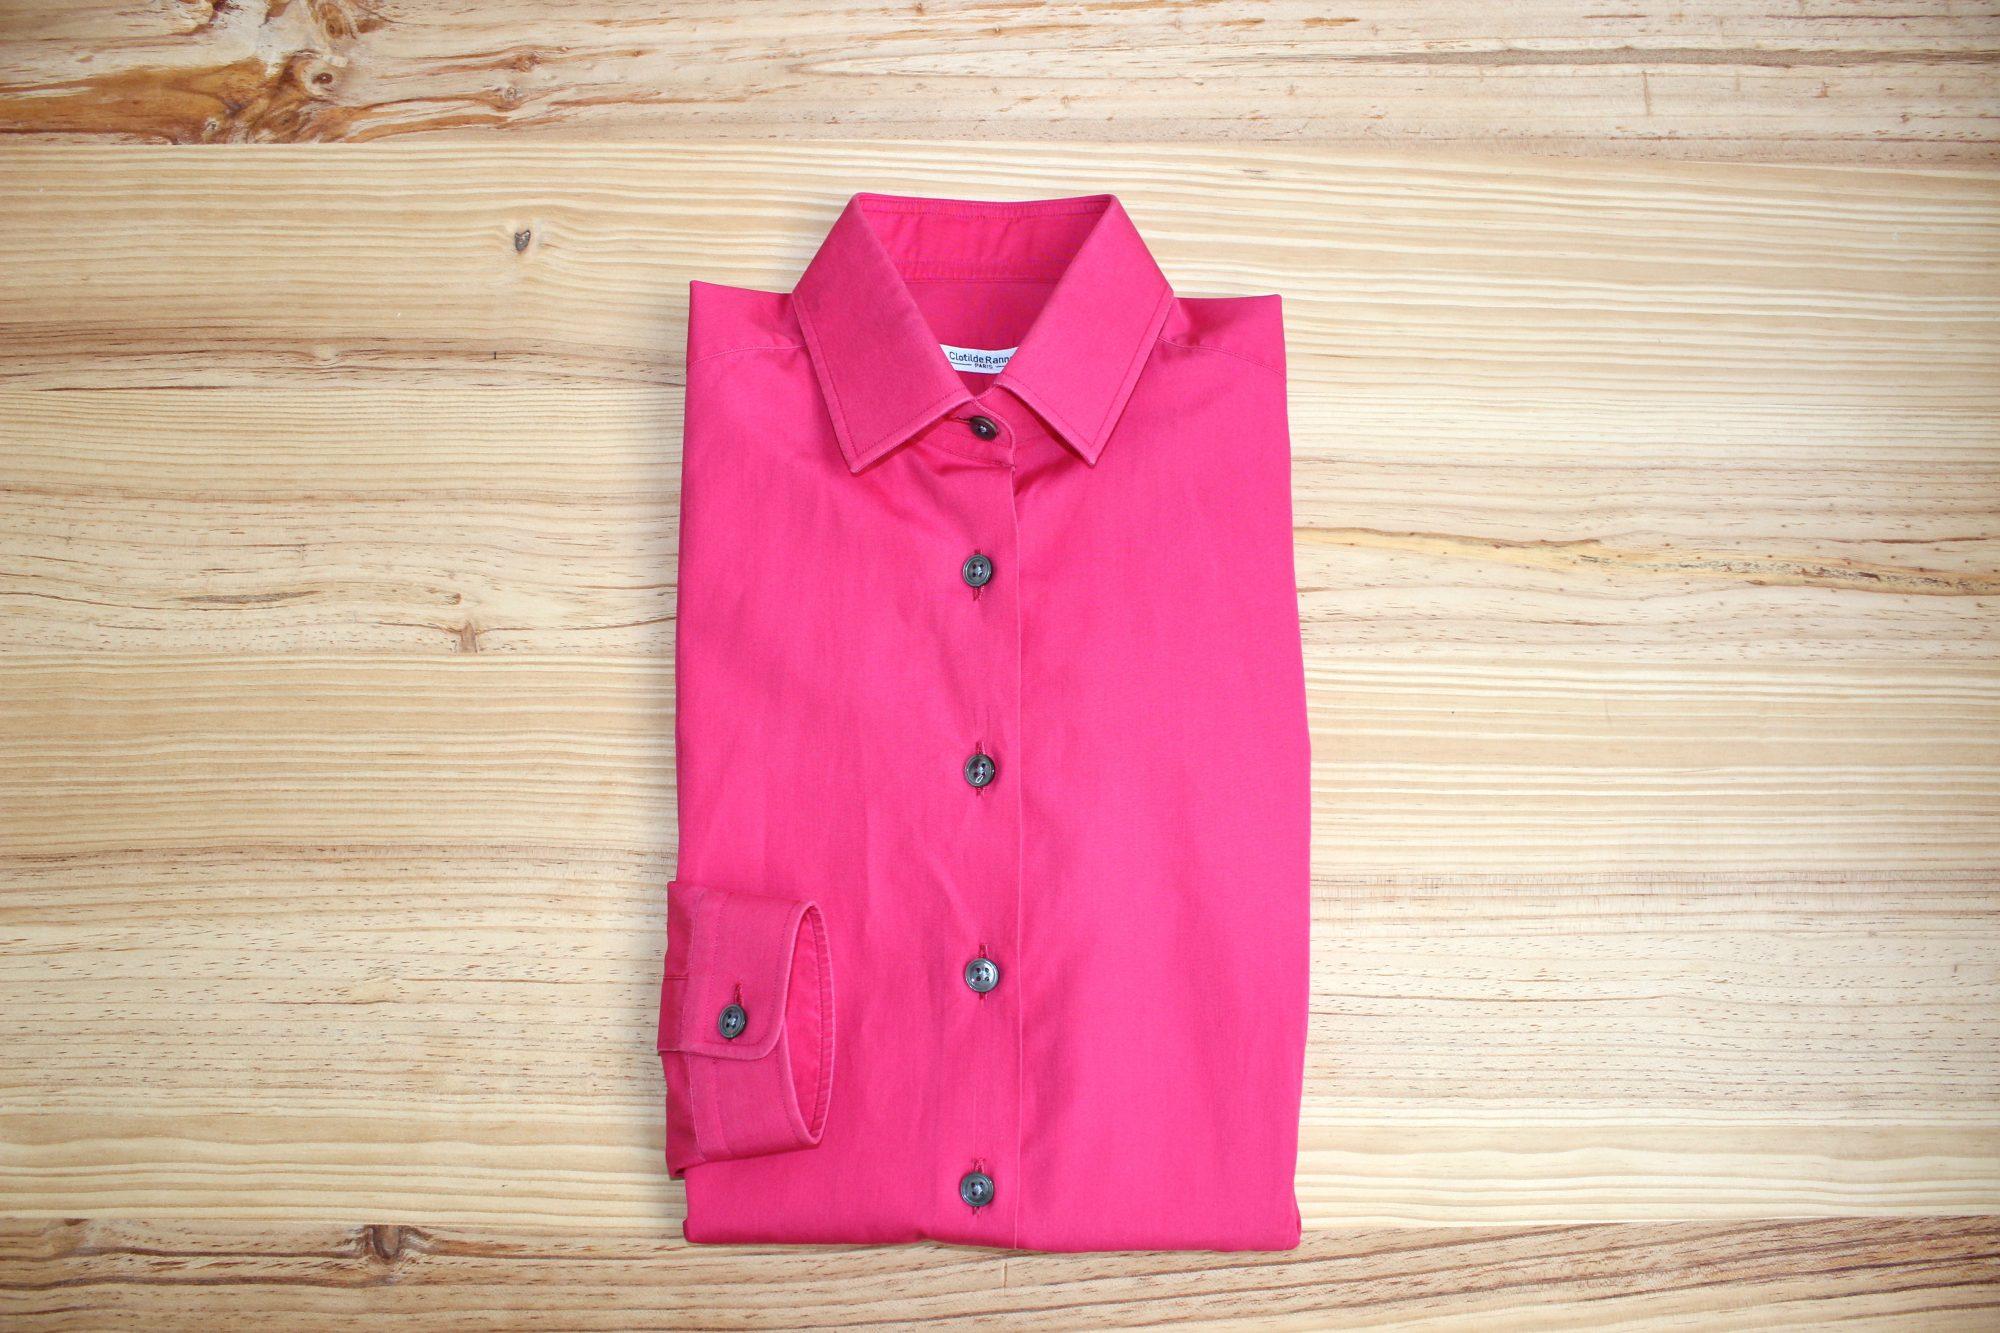 chemise rose popeline , chemise rose sur mesure , chemise rose popeline sur mesure